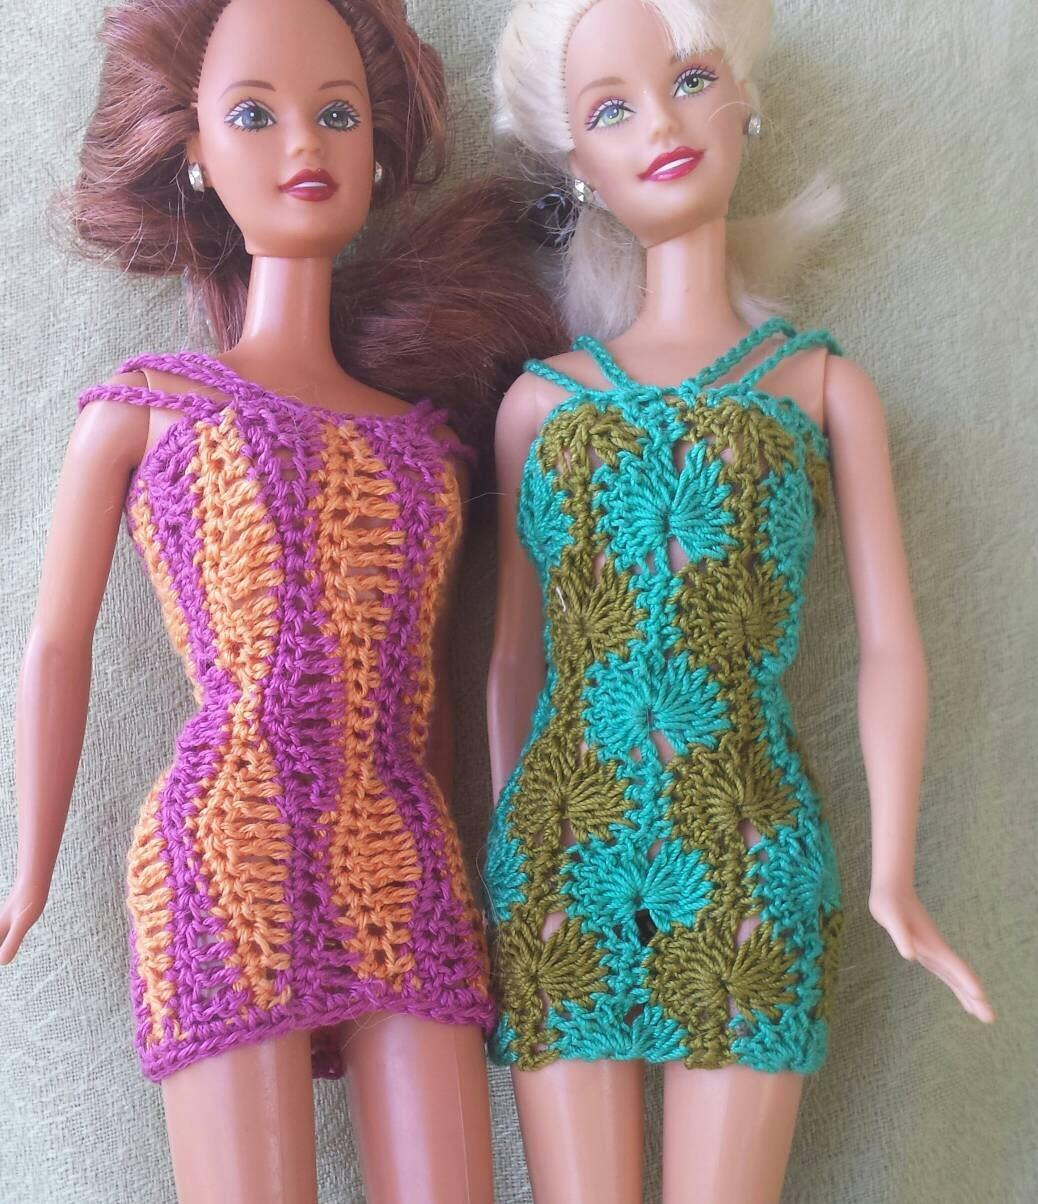 Barbie doll crochet pattern retro modern strappy sundresses from ...